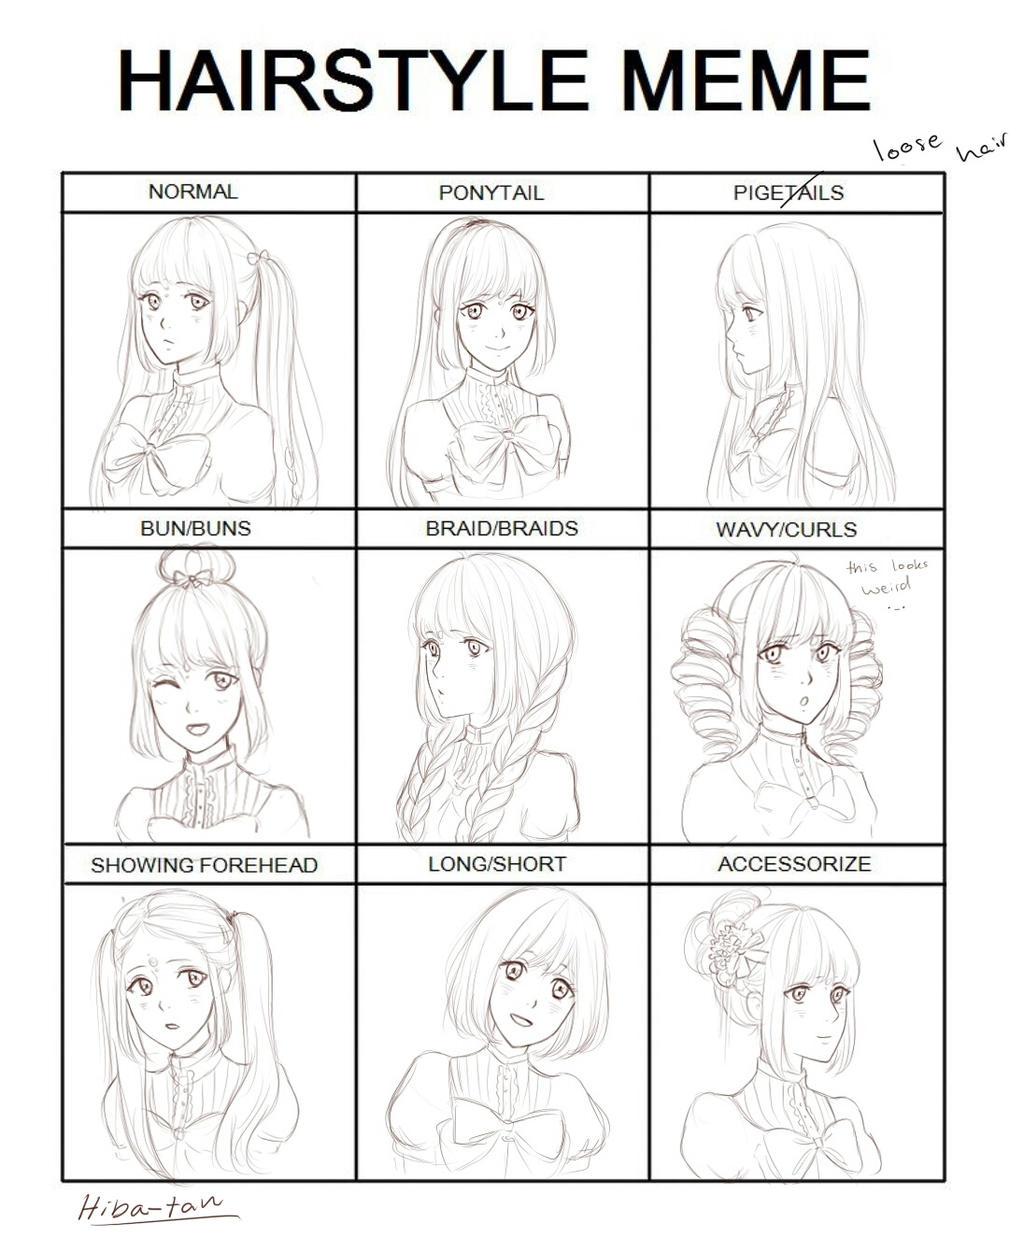 Hairstyle Meme By Hibatan On DeviantArt - Hairstyle drawing meme